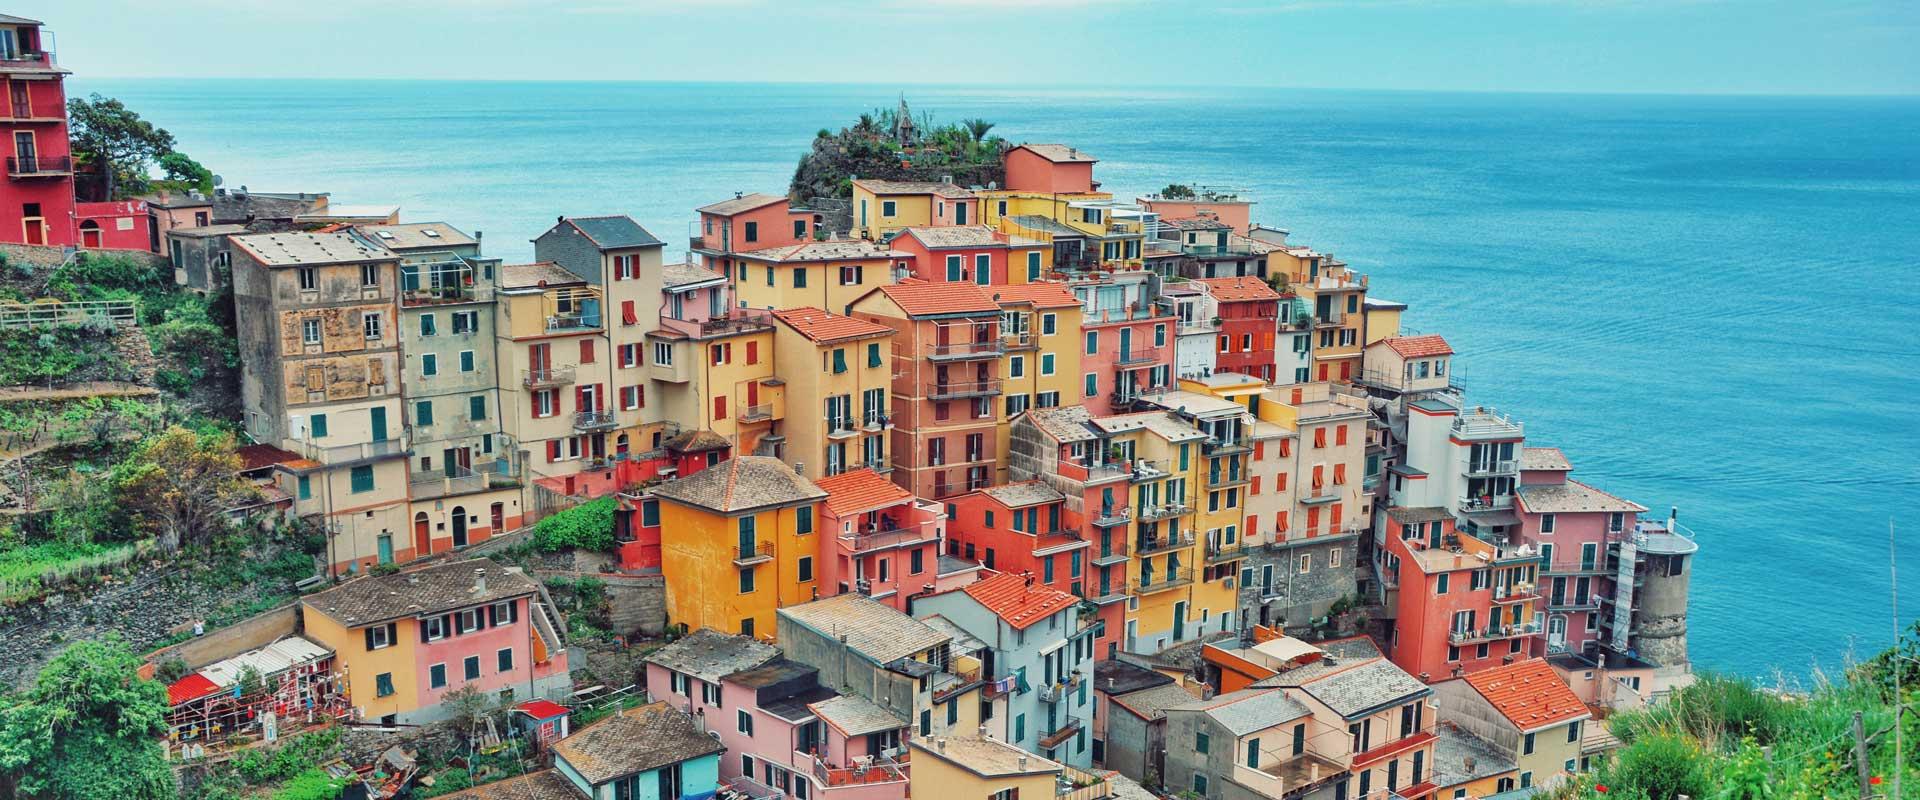 Cinque Terre og Portofino